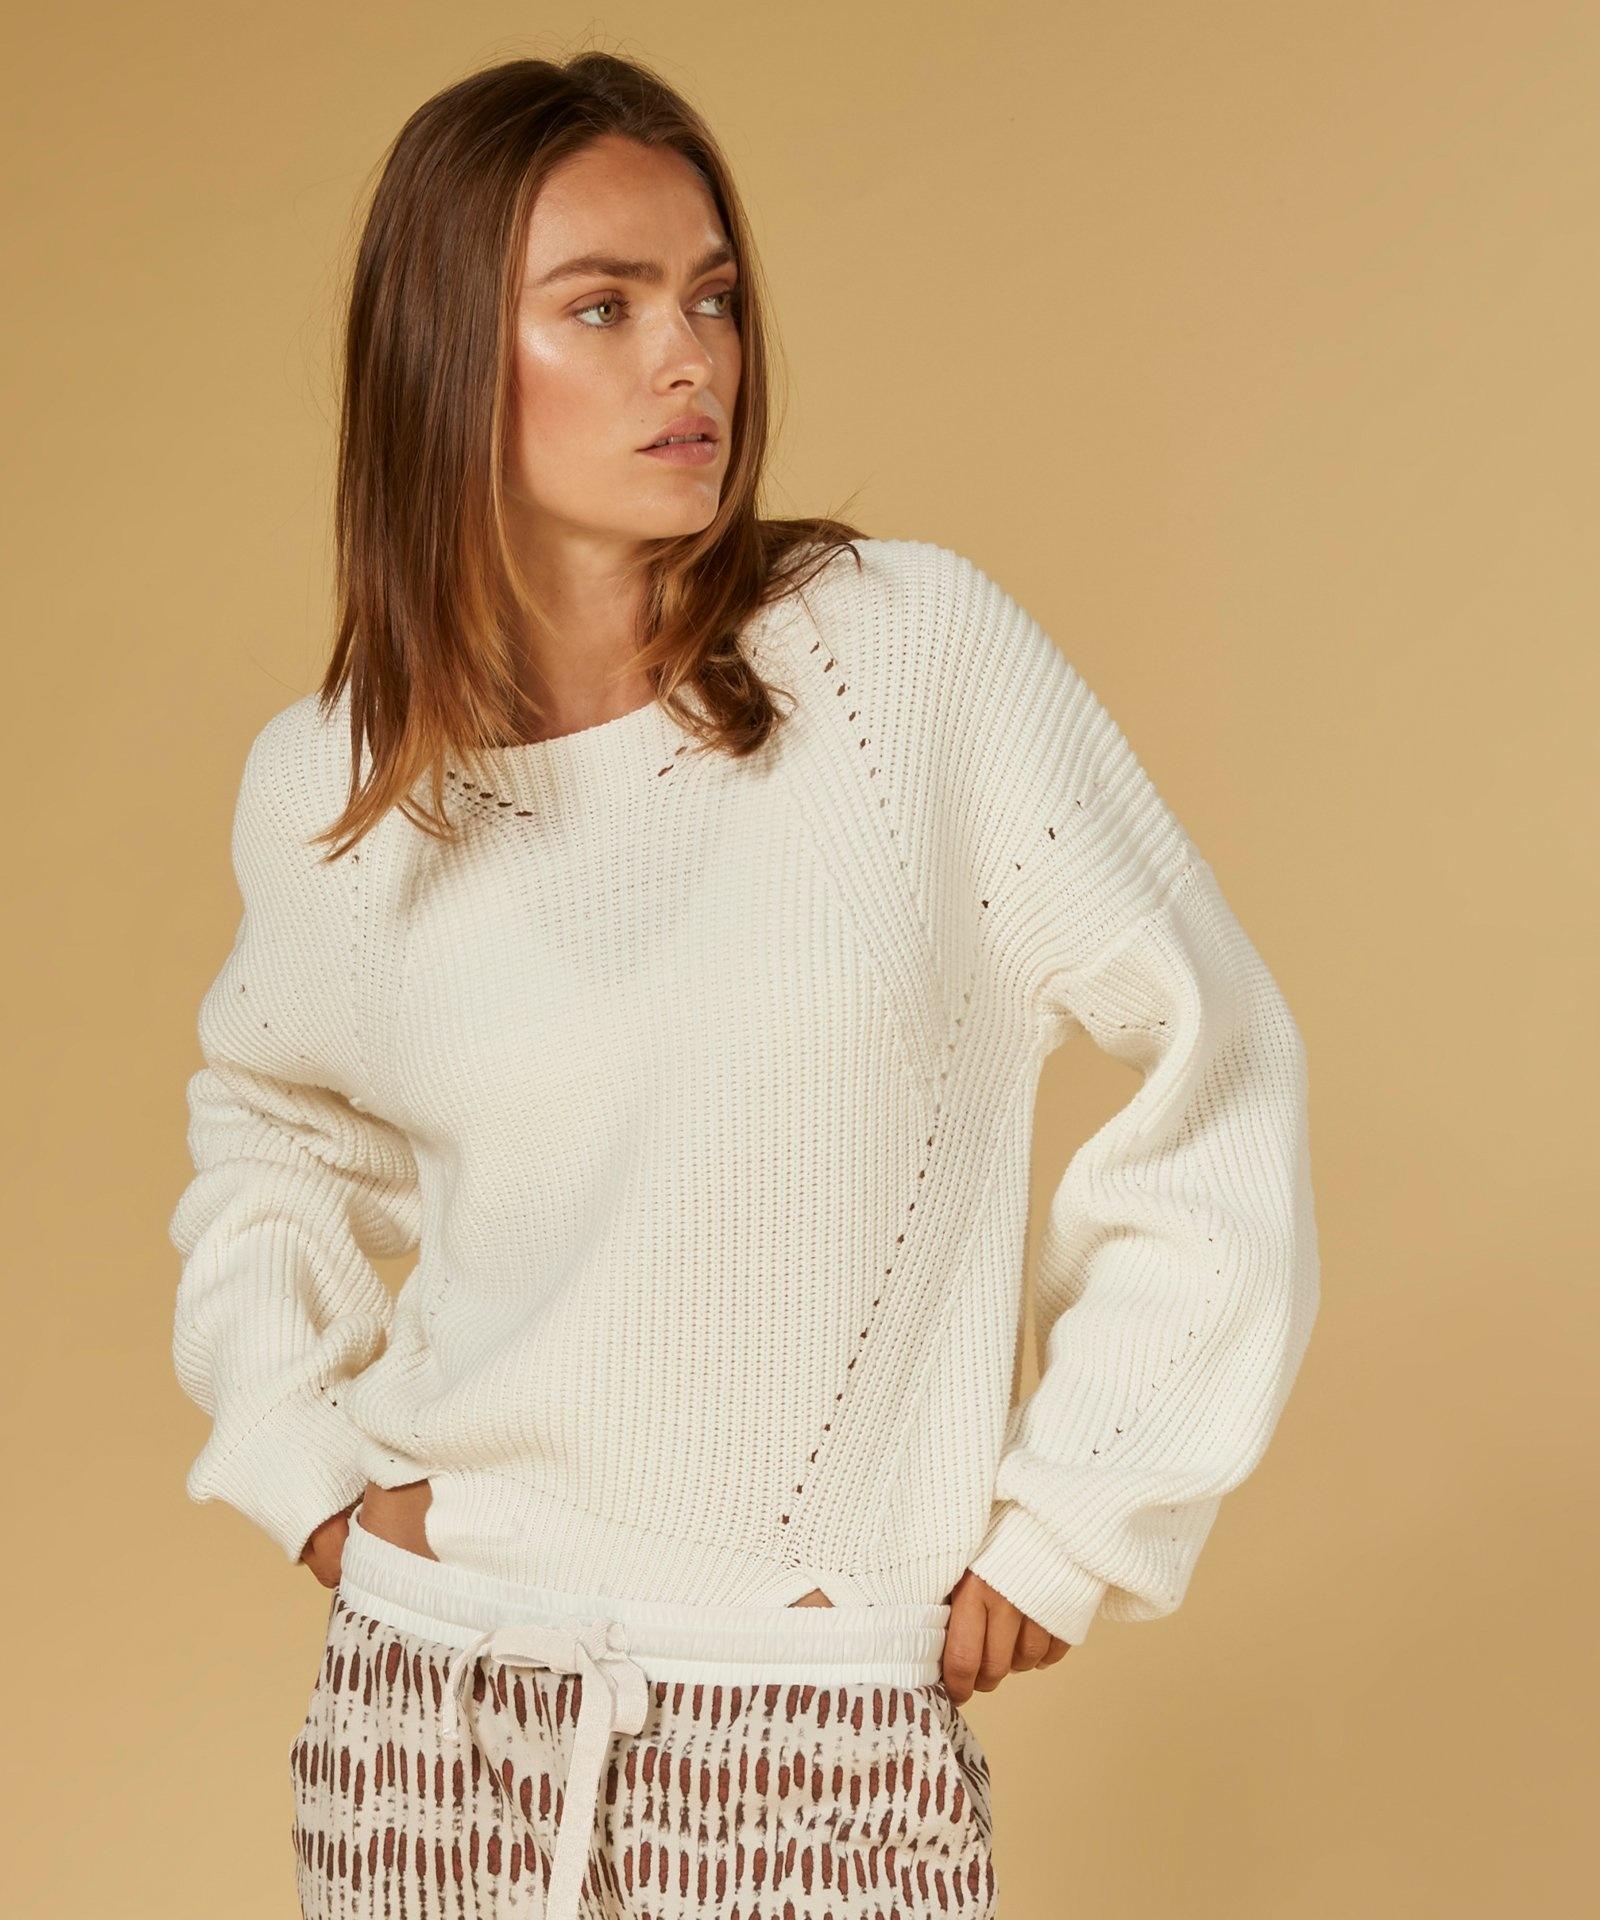 Trui sweater cotton knit white-3